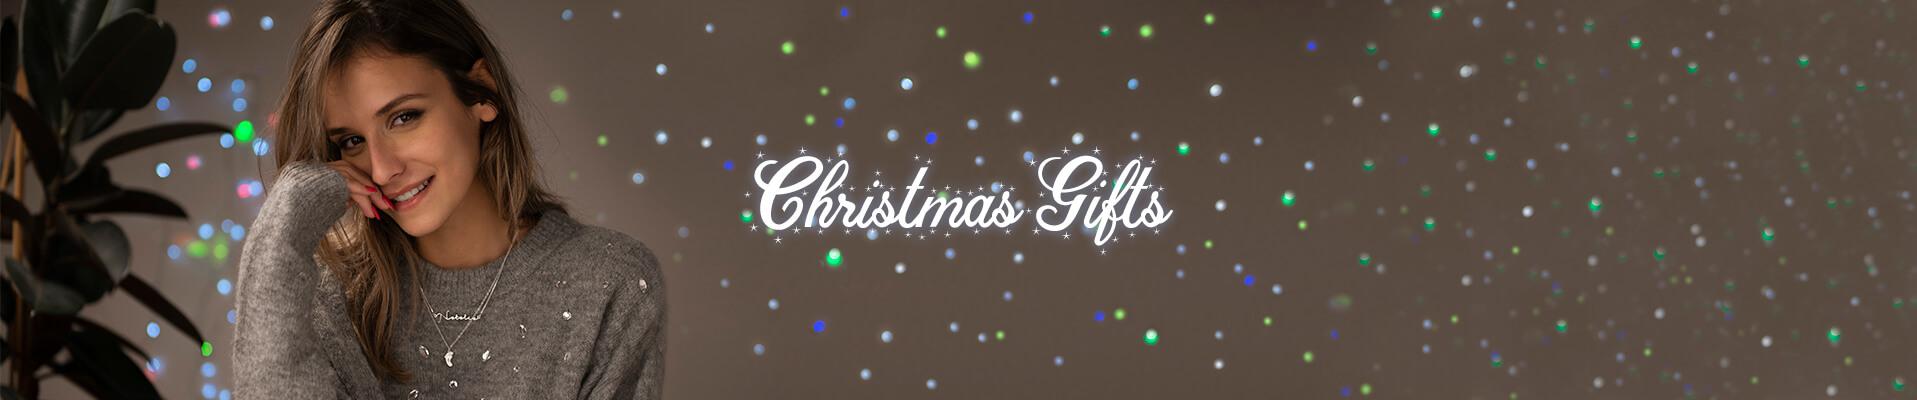 Christmas gifts desktop banner